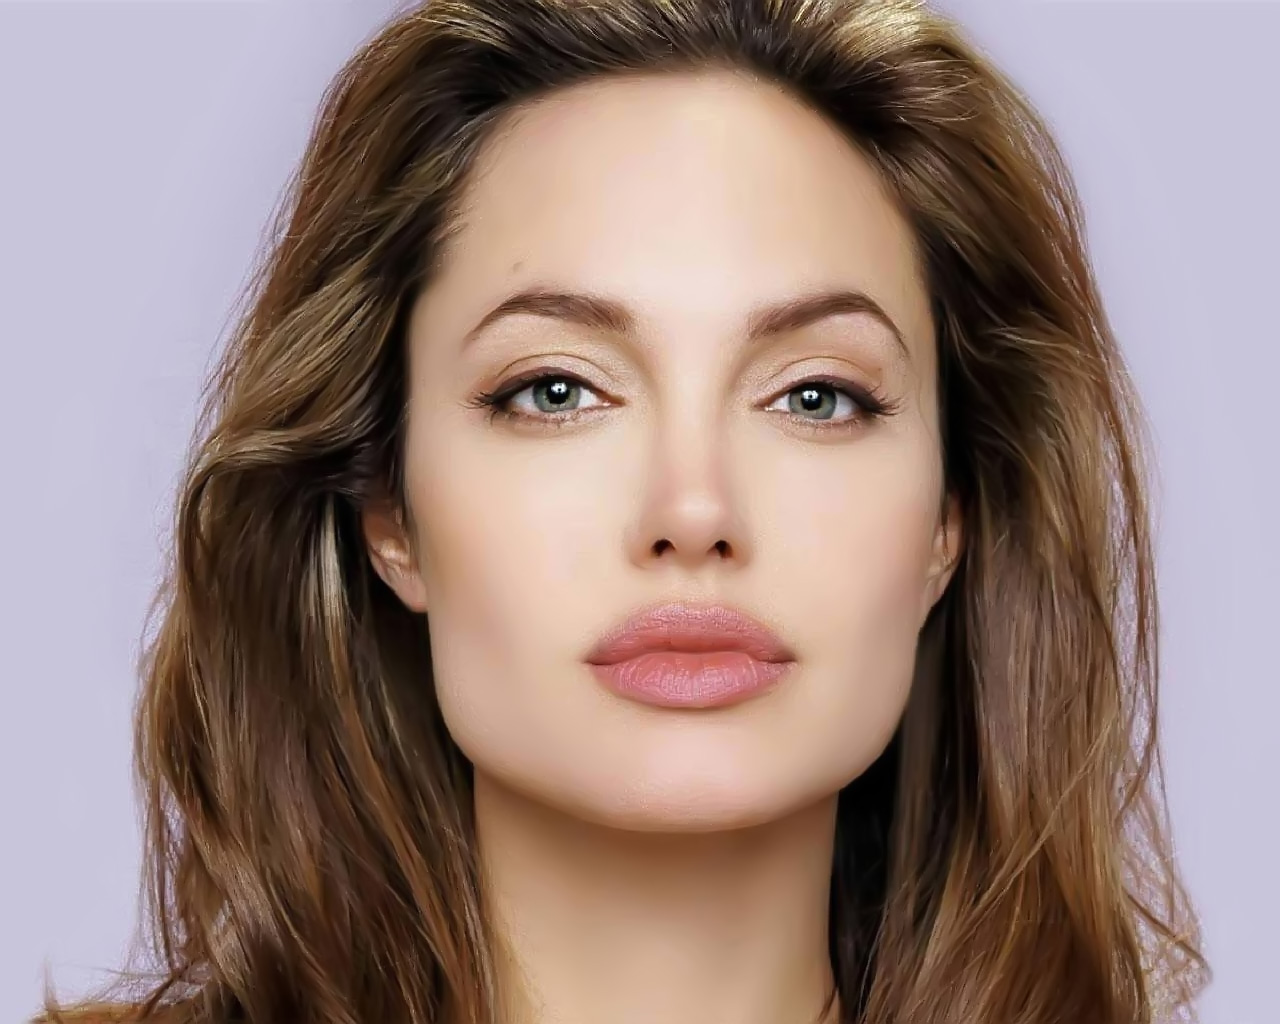 http://3.bp.blogspot.com/-krLtAg4404U/T8KEjKAYp8I/AAAAAAAAADo/i233TLmPcFs/s1600/Angelina+Jolie3.jpg